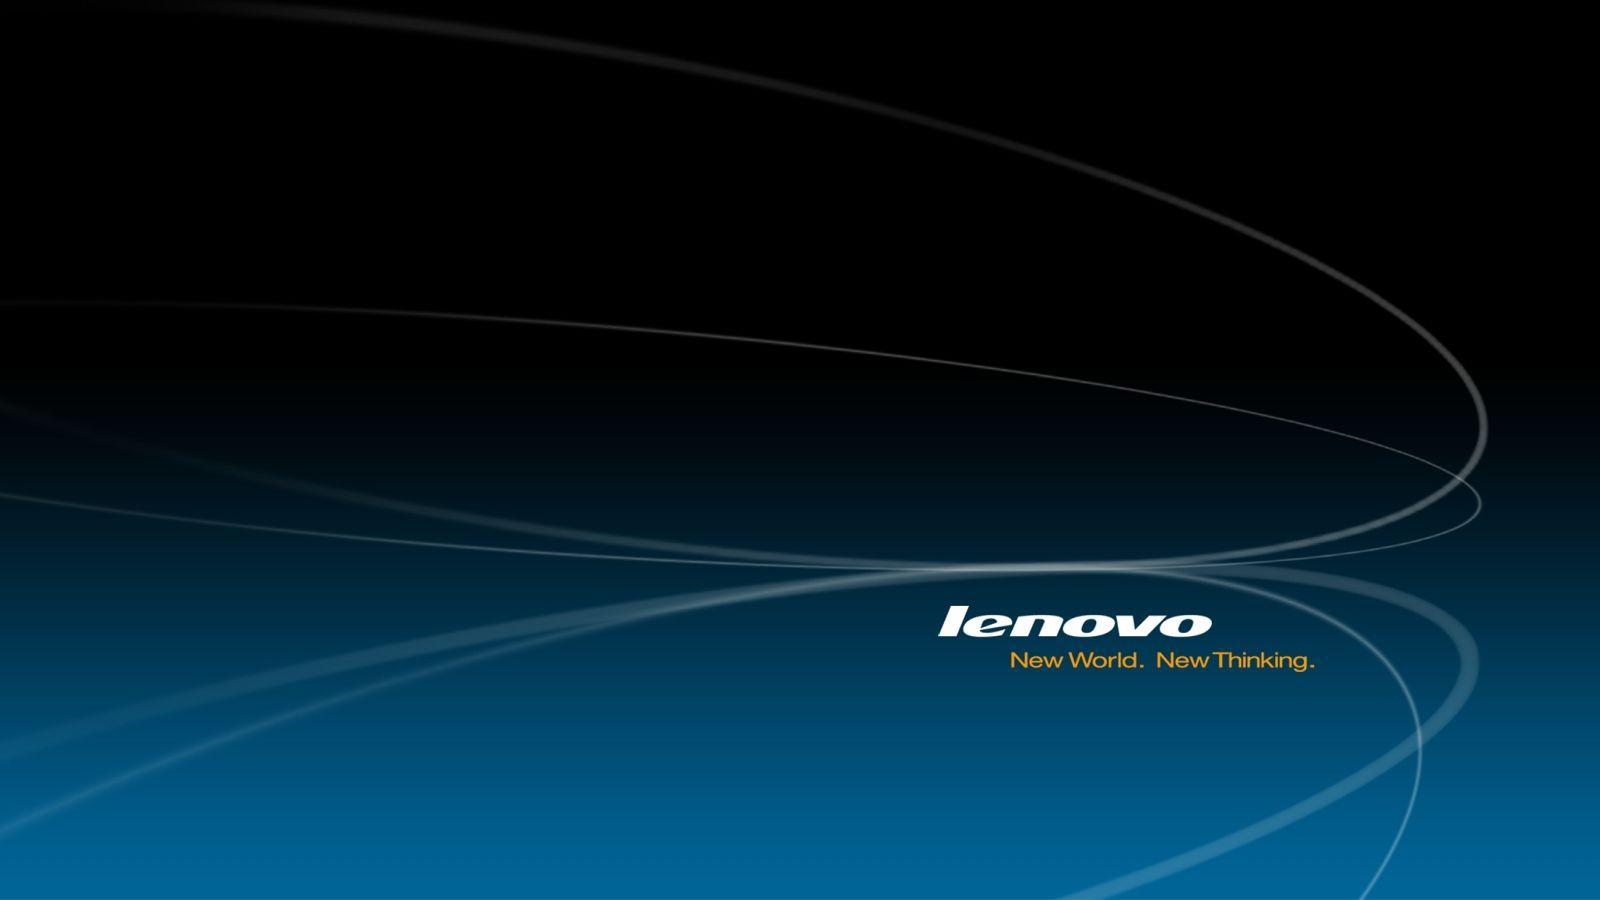 Lenovo 4K Wallpapers - Top Free Lenovo 4K Backgrounds